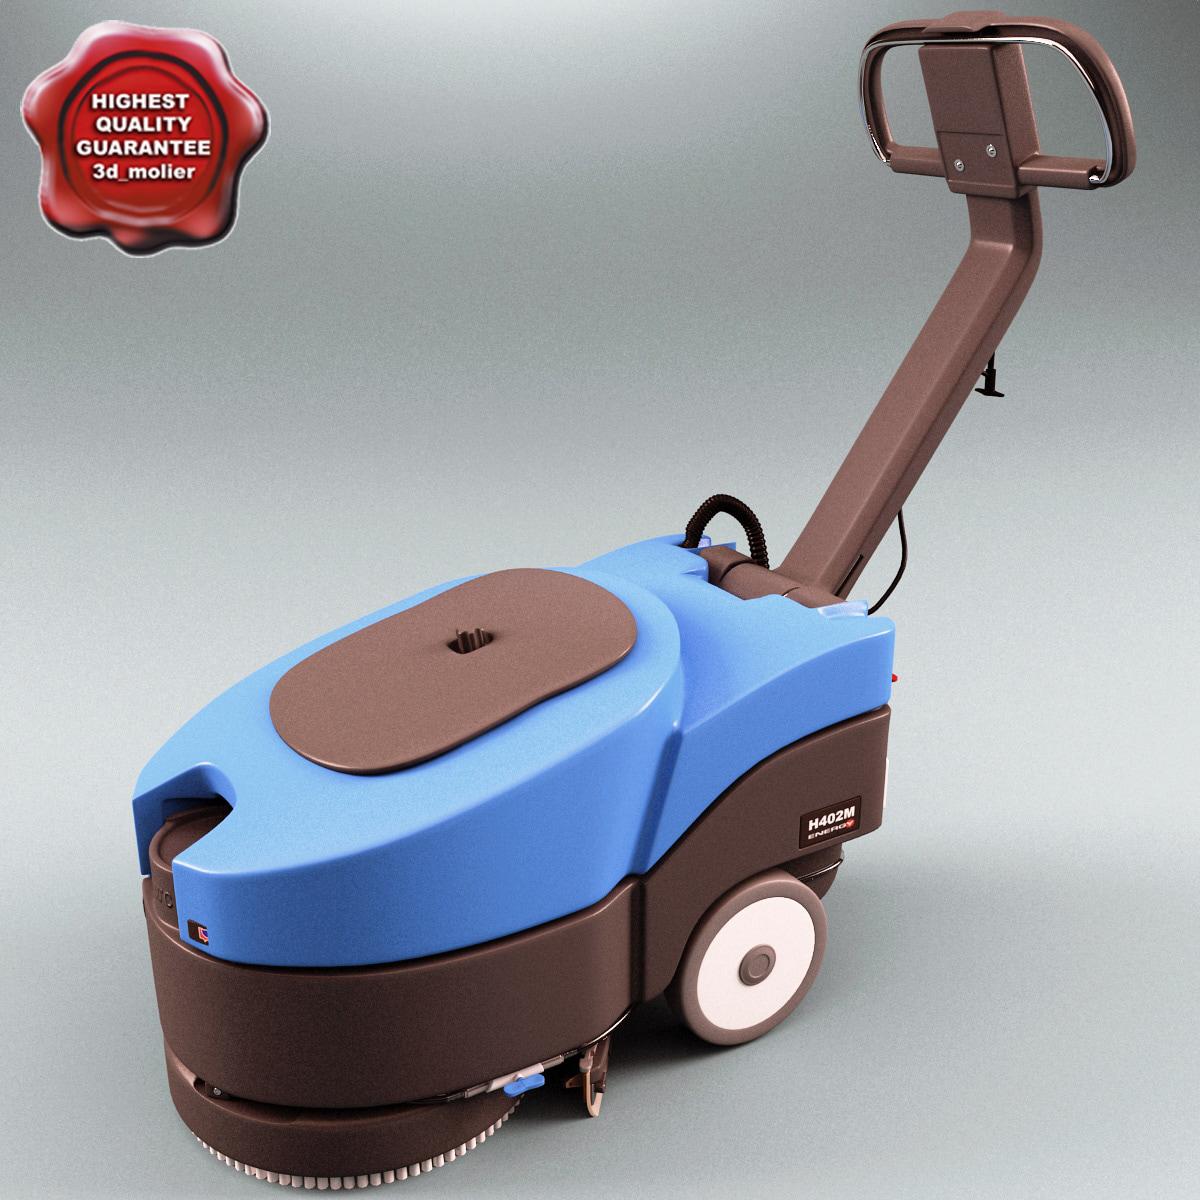 Professional_Washer-Dryer_h402m_00.jpg